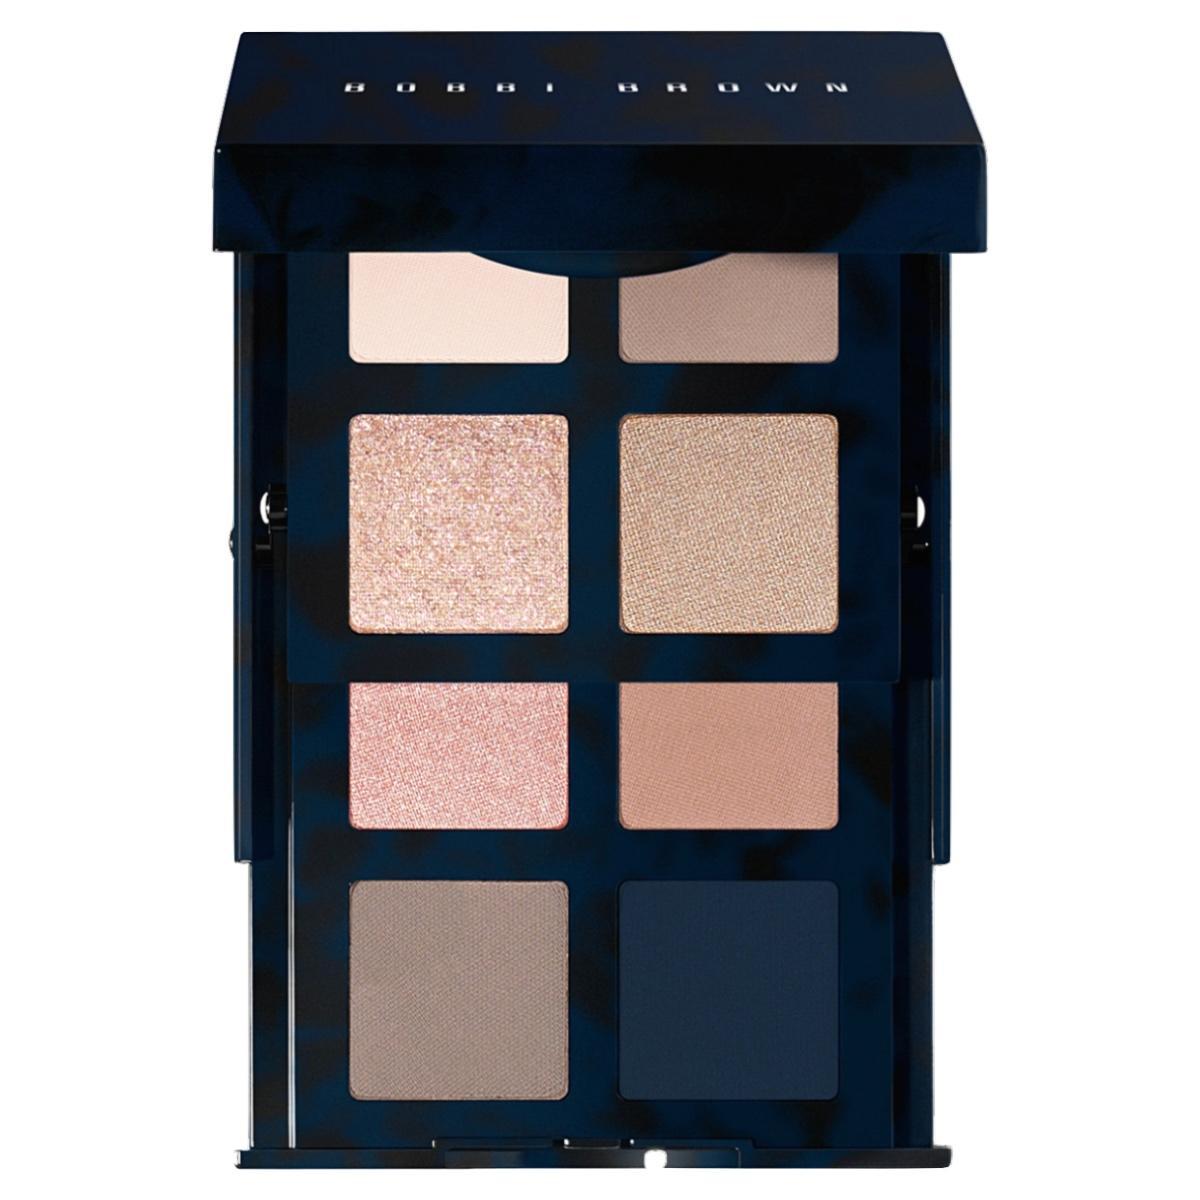 Bobbi Brown Summer Collection Navy & Nude Eye Palette